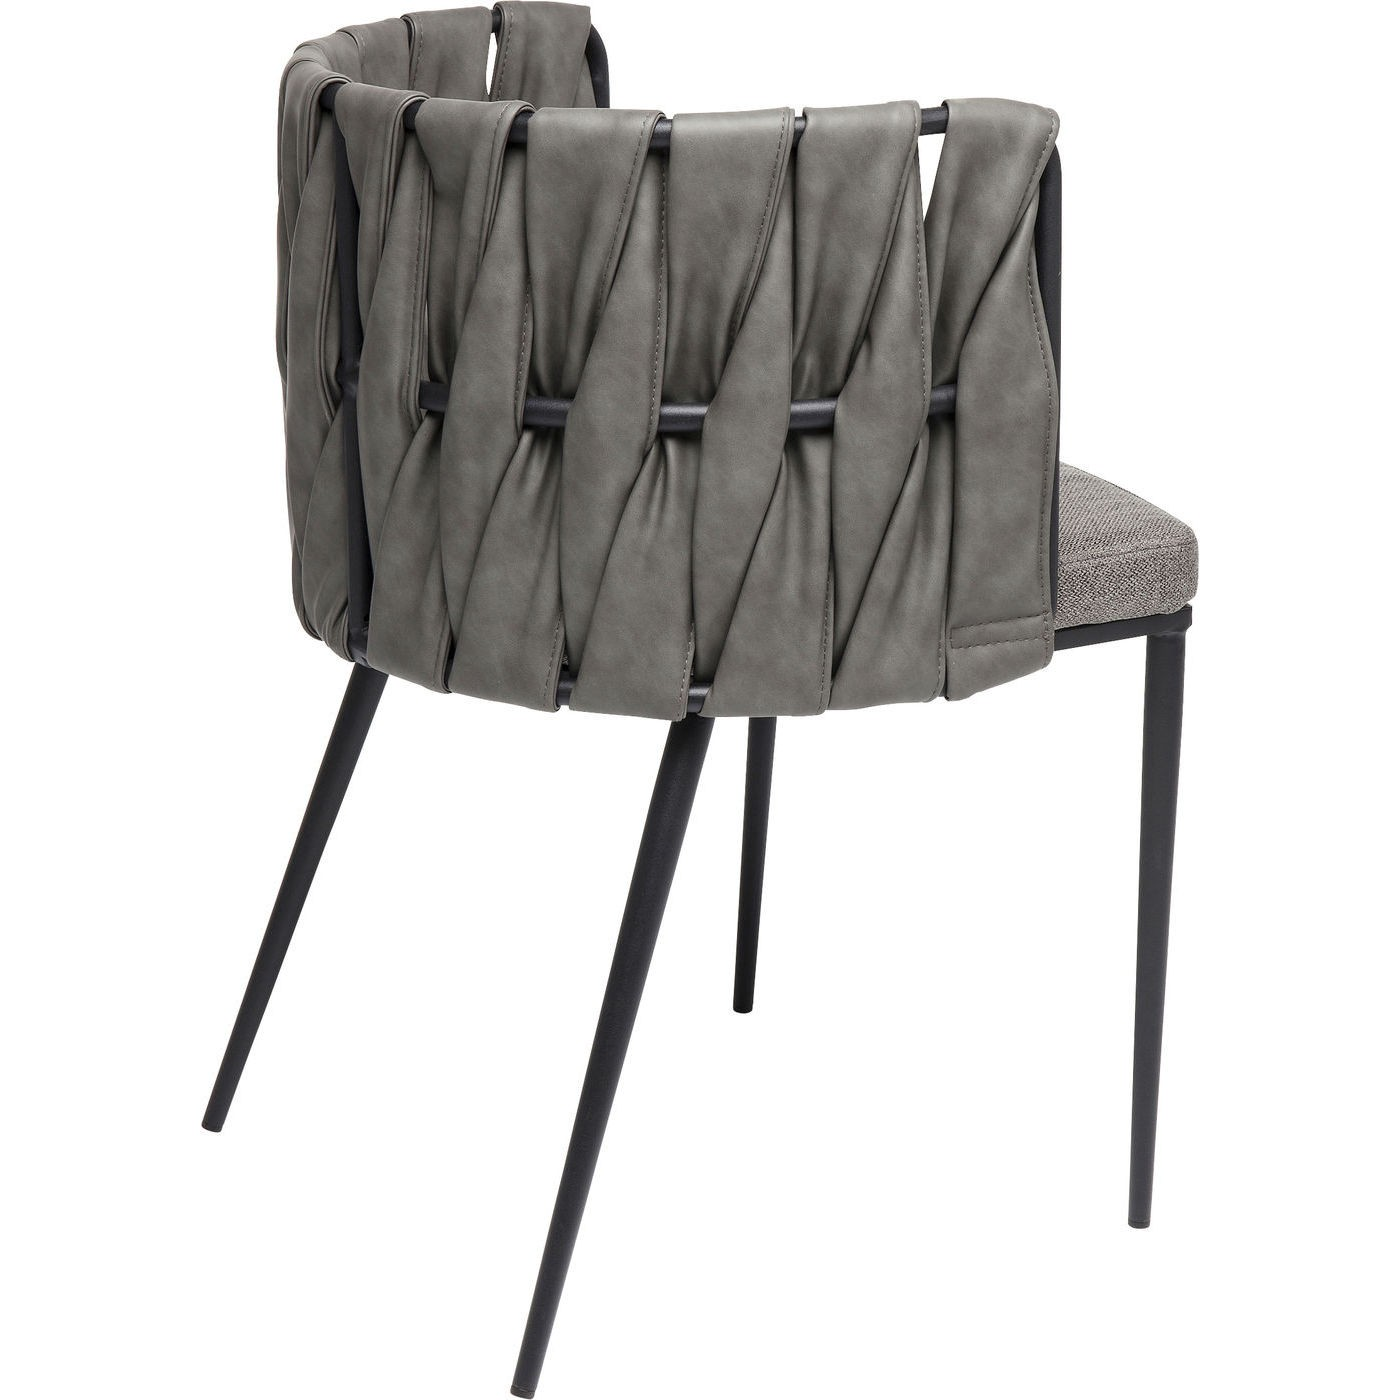 Chaise avec accoudoirs Cheerio grise Kare Design